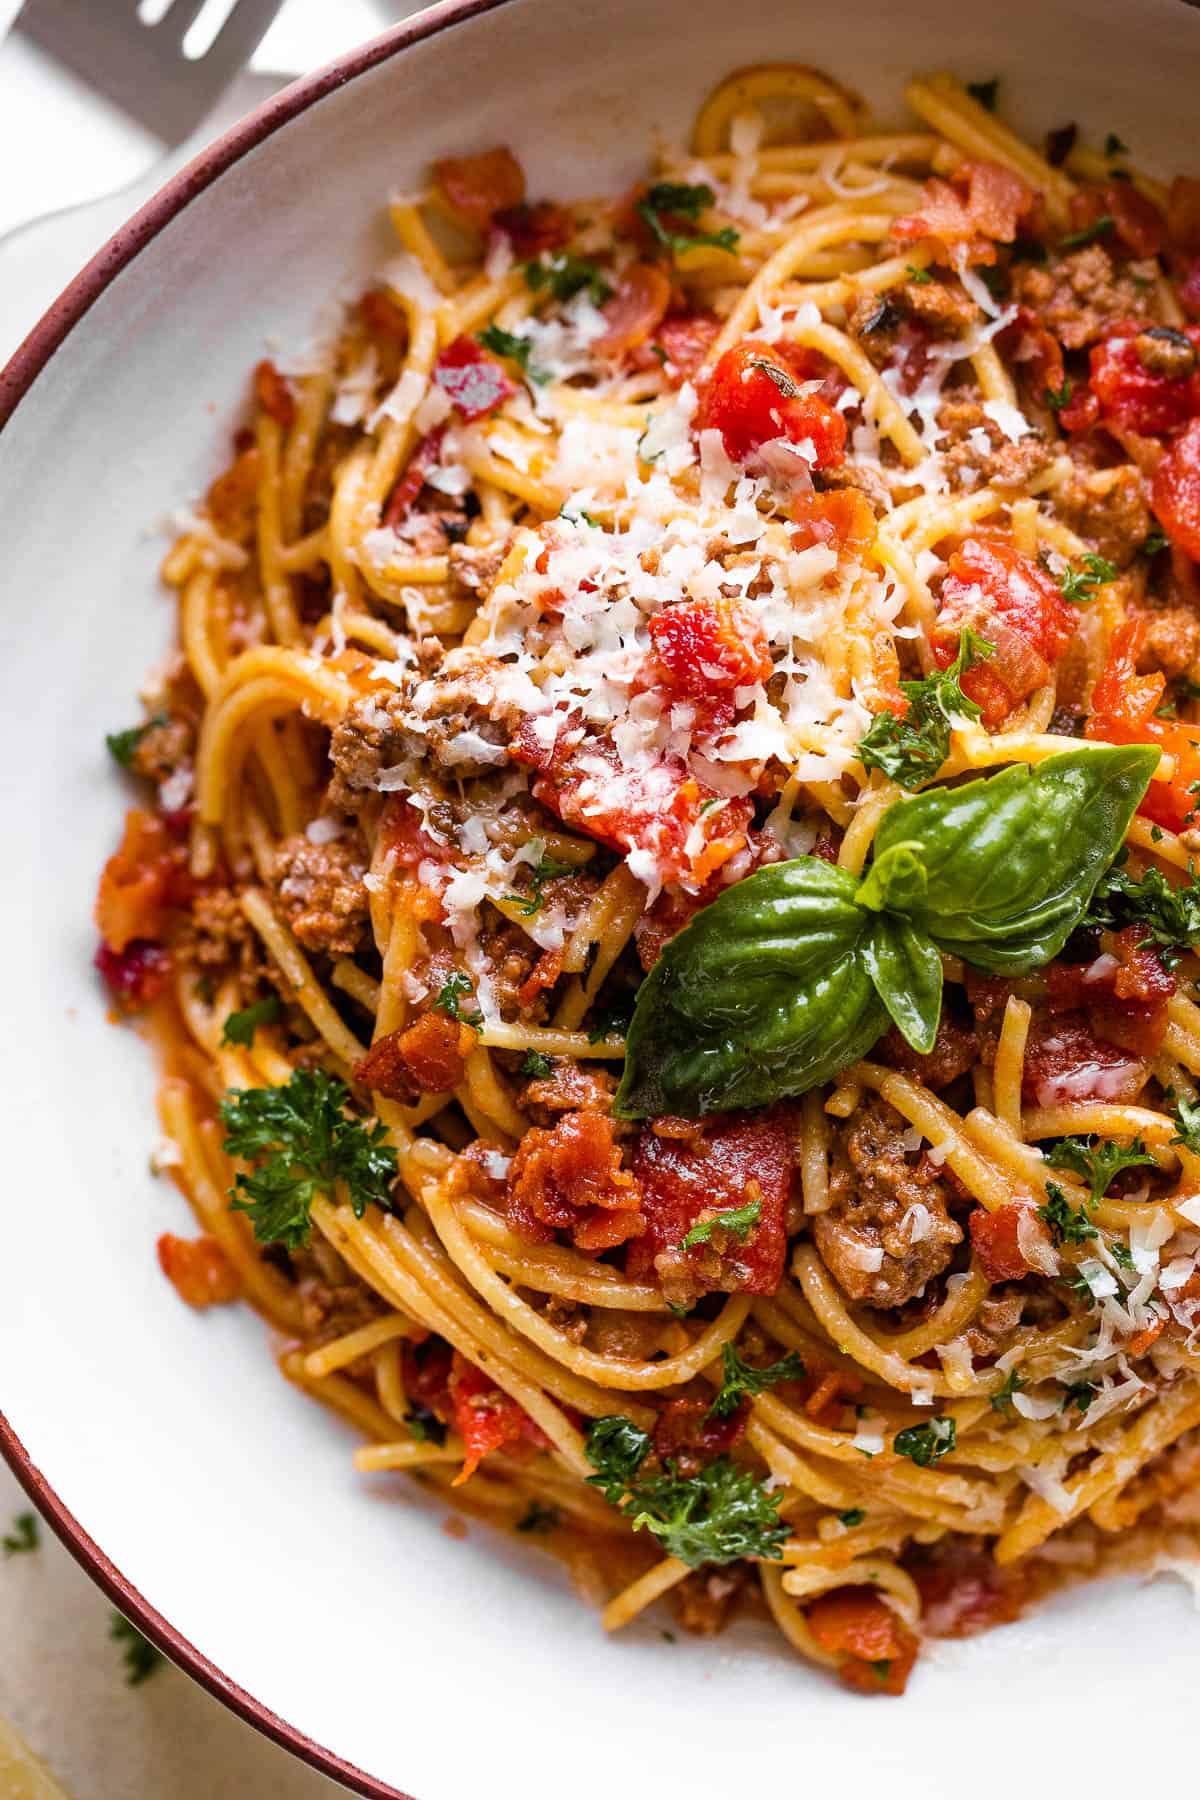 Instant Pot Spaghetti served in a pasta bowl